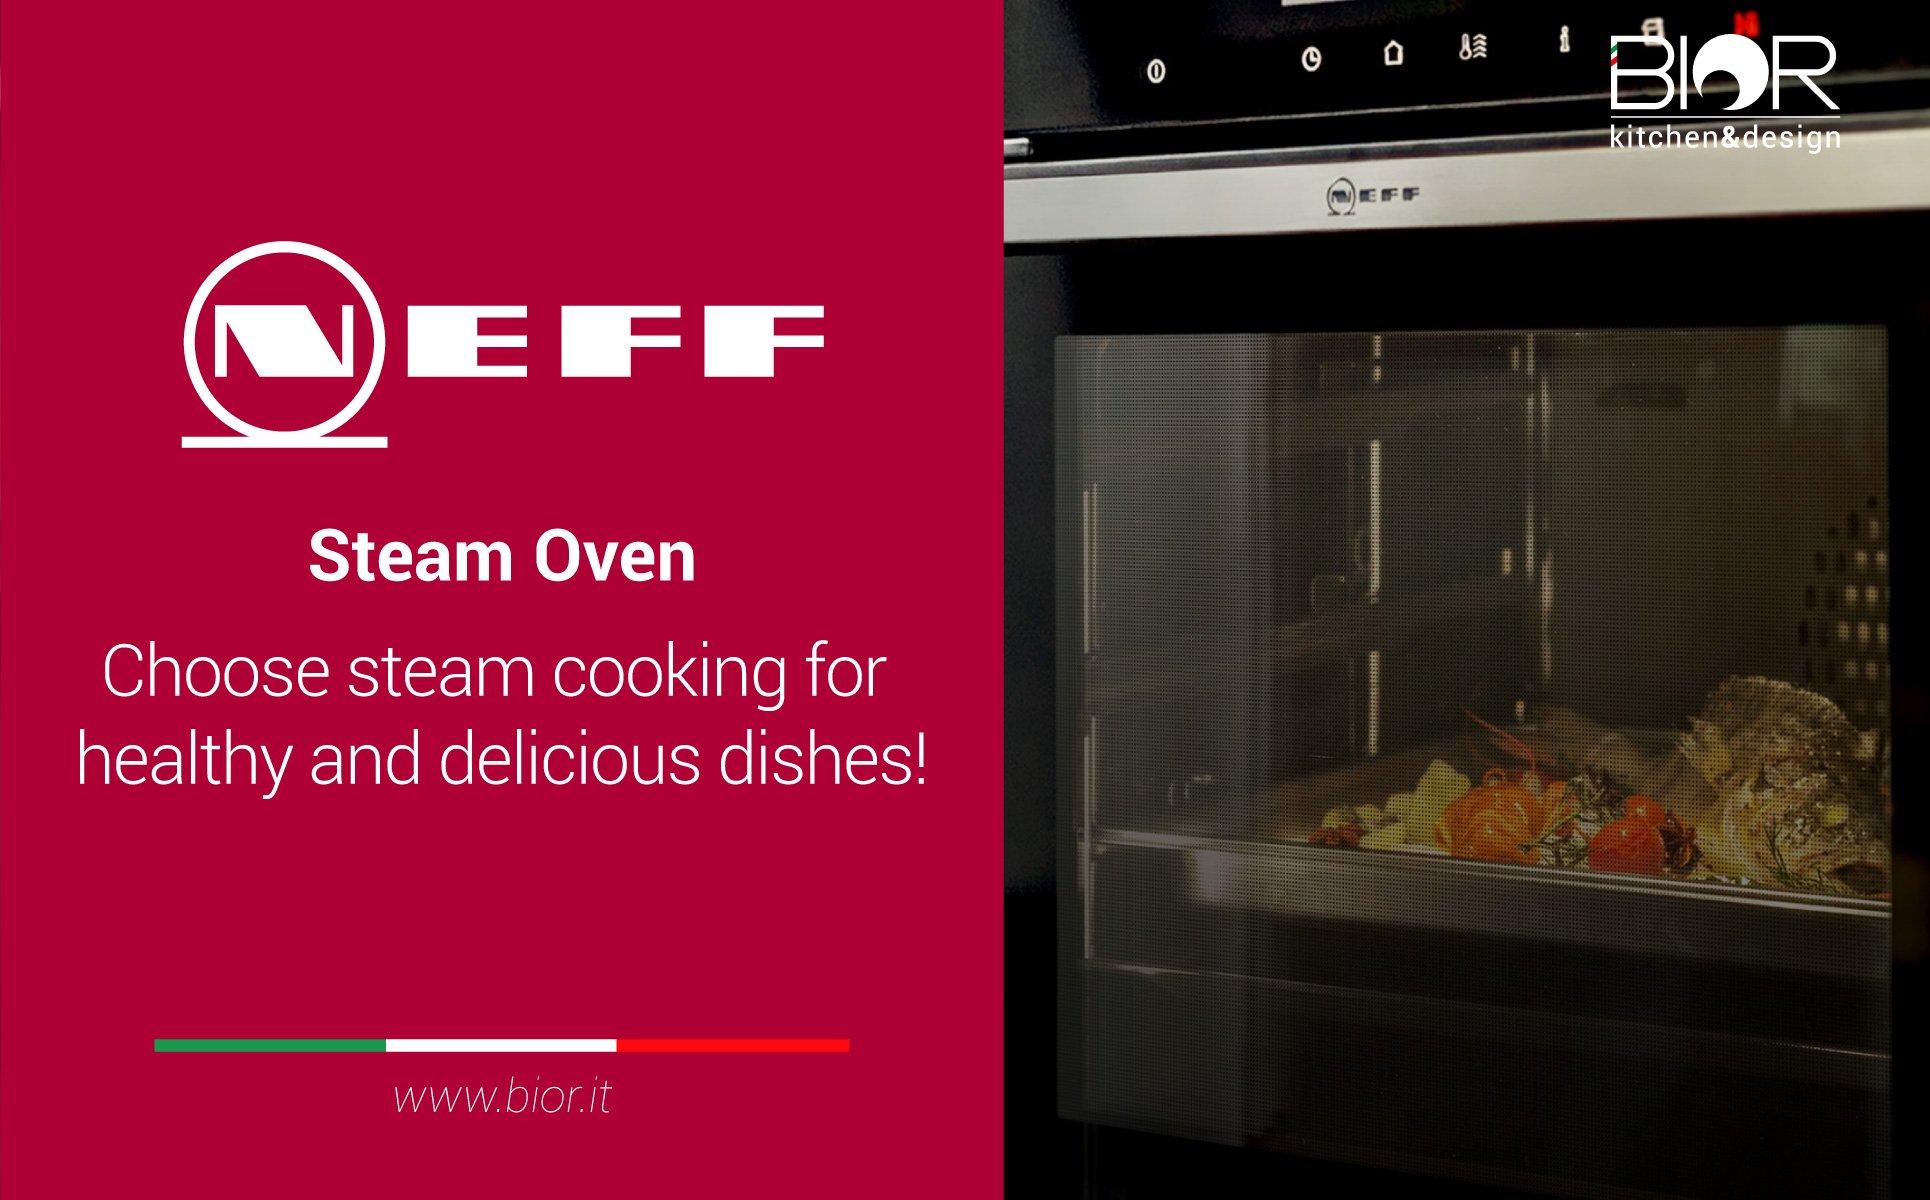 Neff Steam Ovens